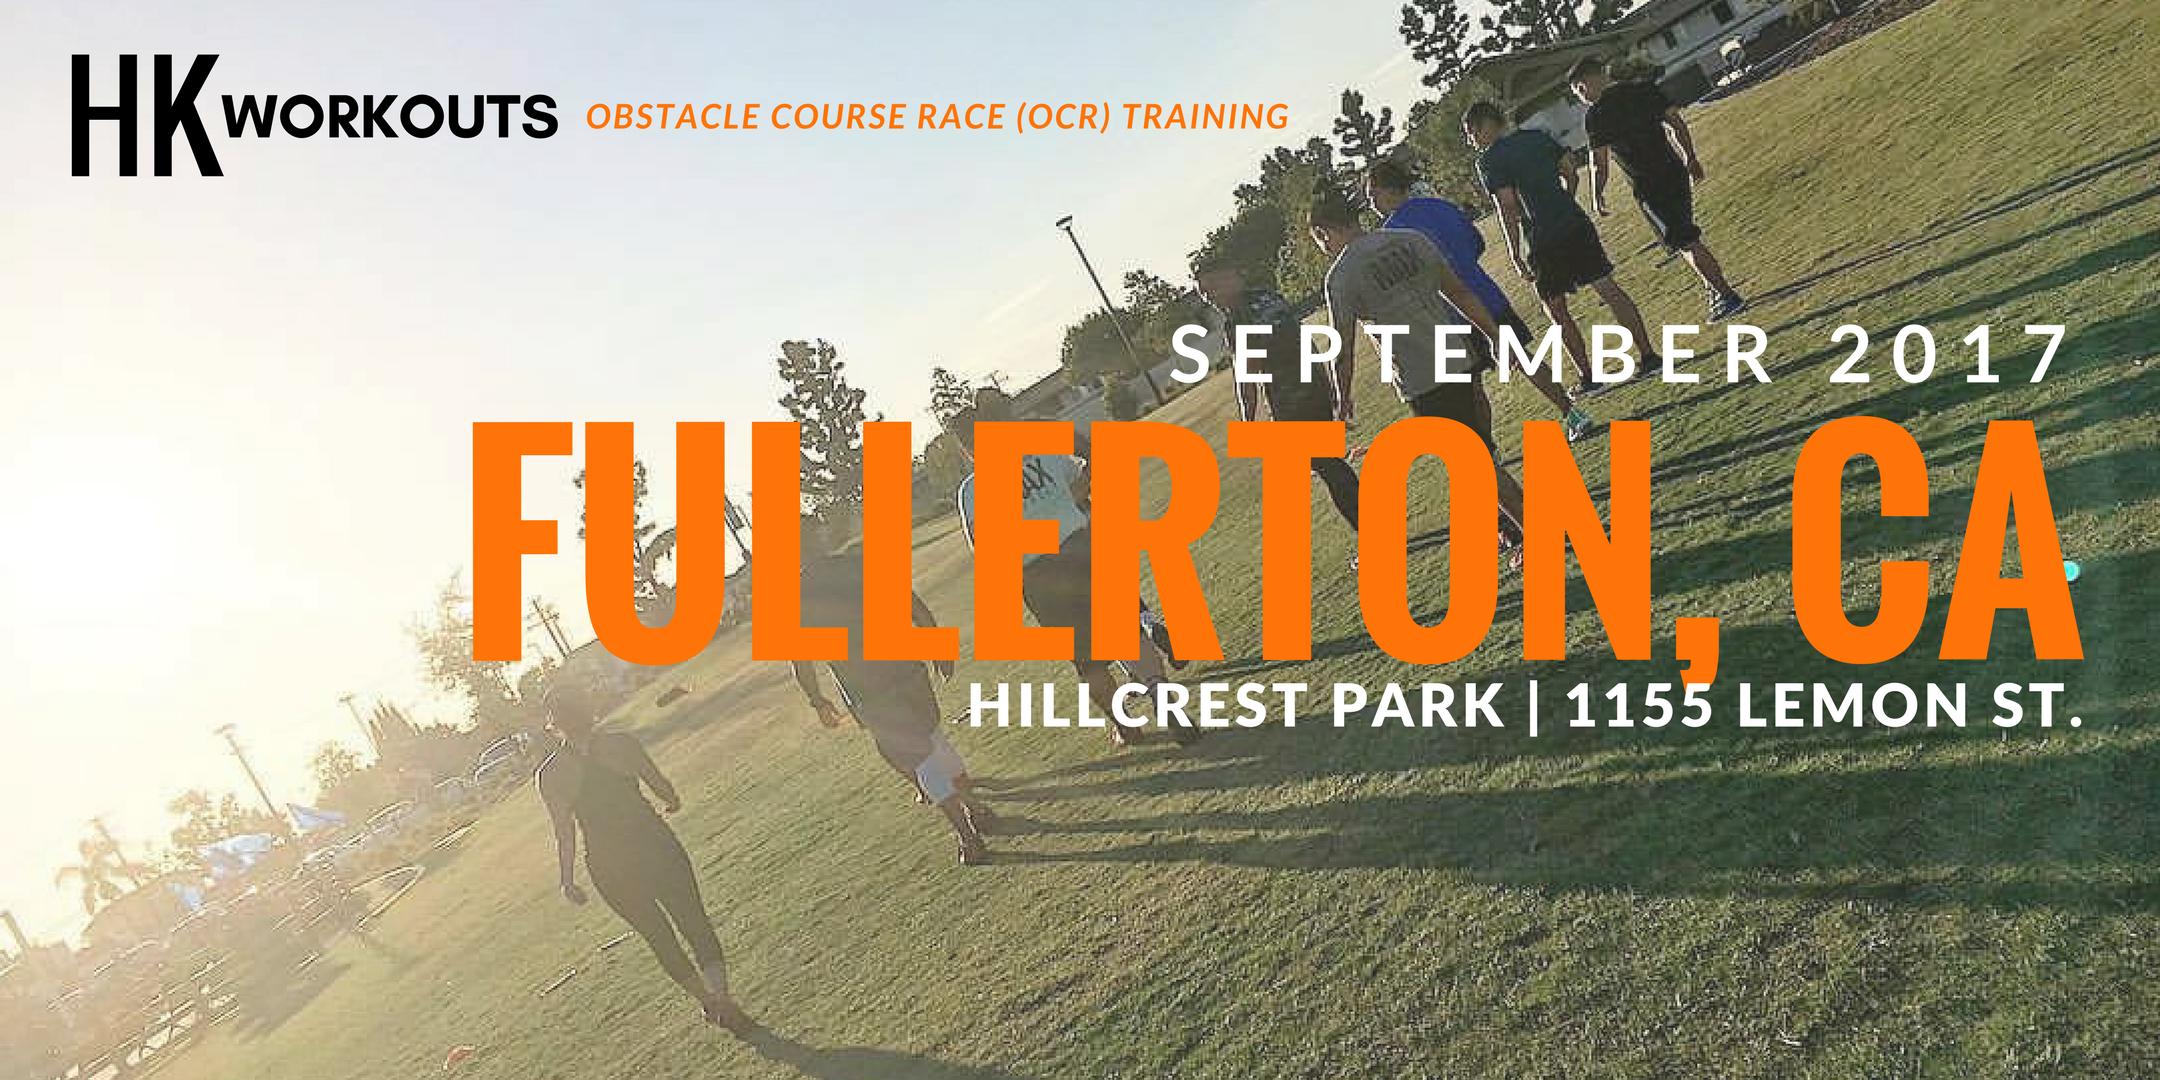 HARDKOUR WORKOUTS - Fullerton, CA // 09.28.17